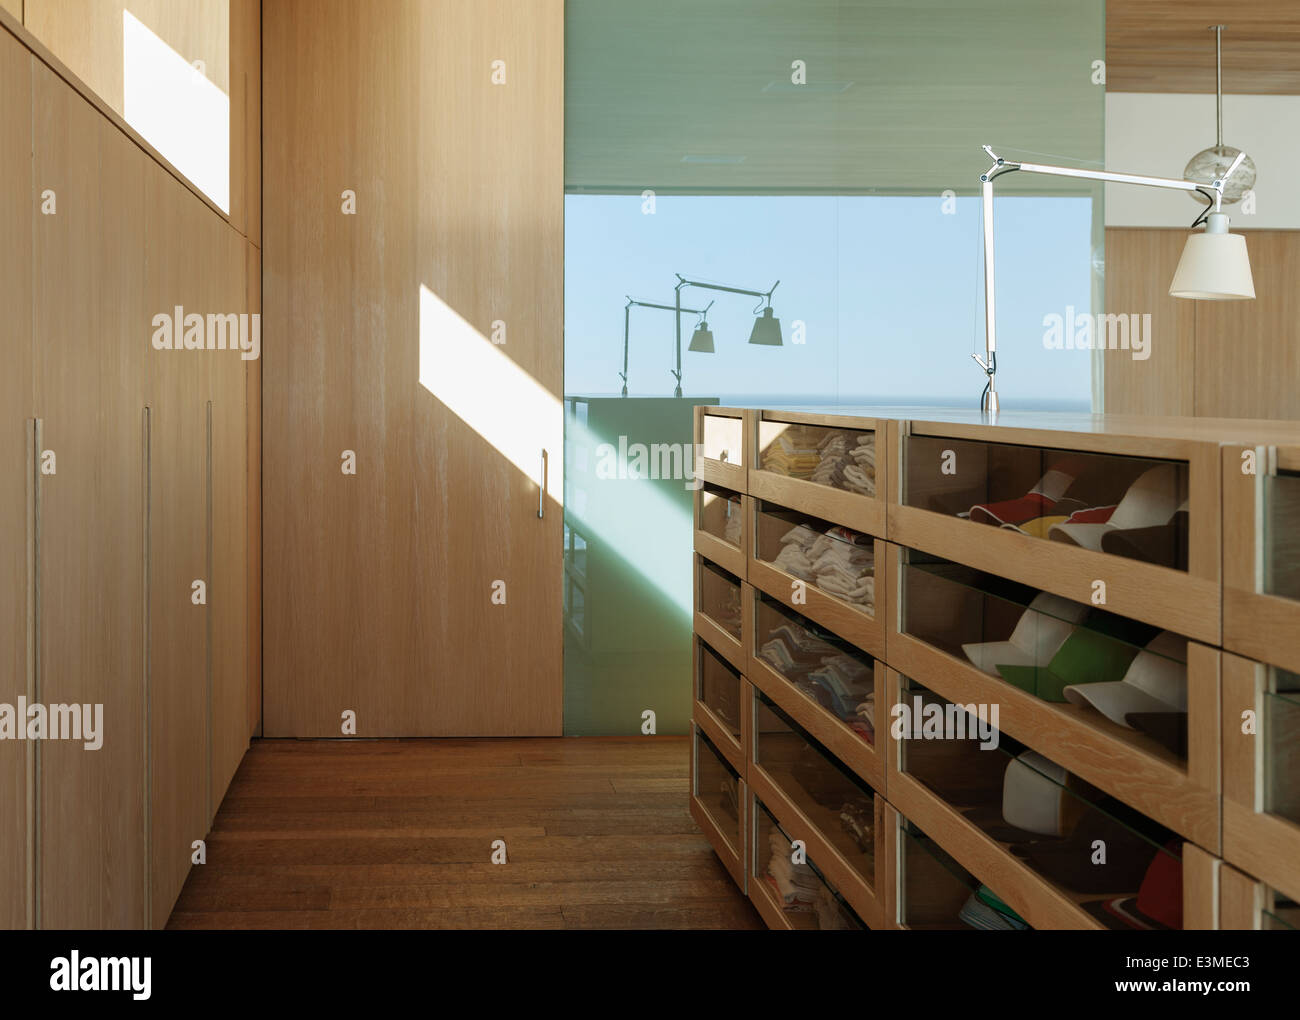 closet stockfotos closet bilder alamy. Black Bedroom Furniture Sets. Home Design Ideas